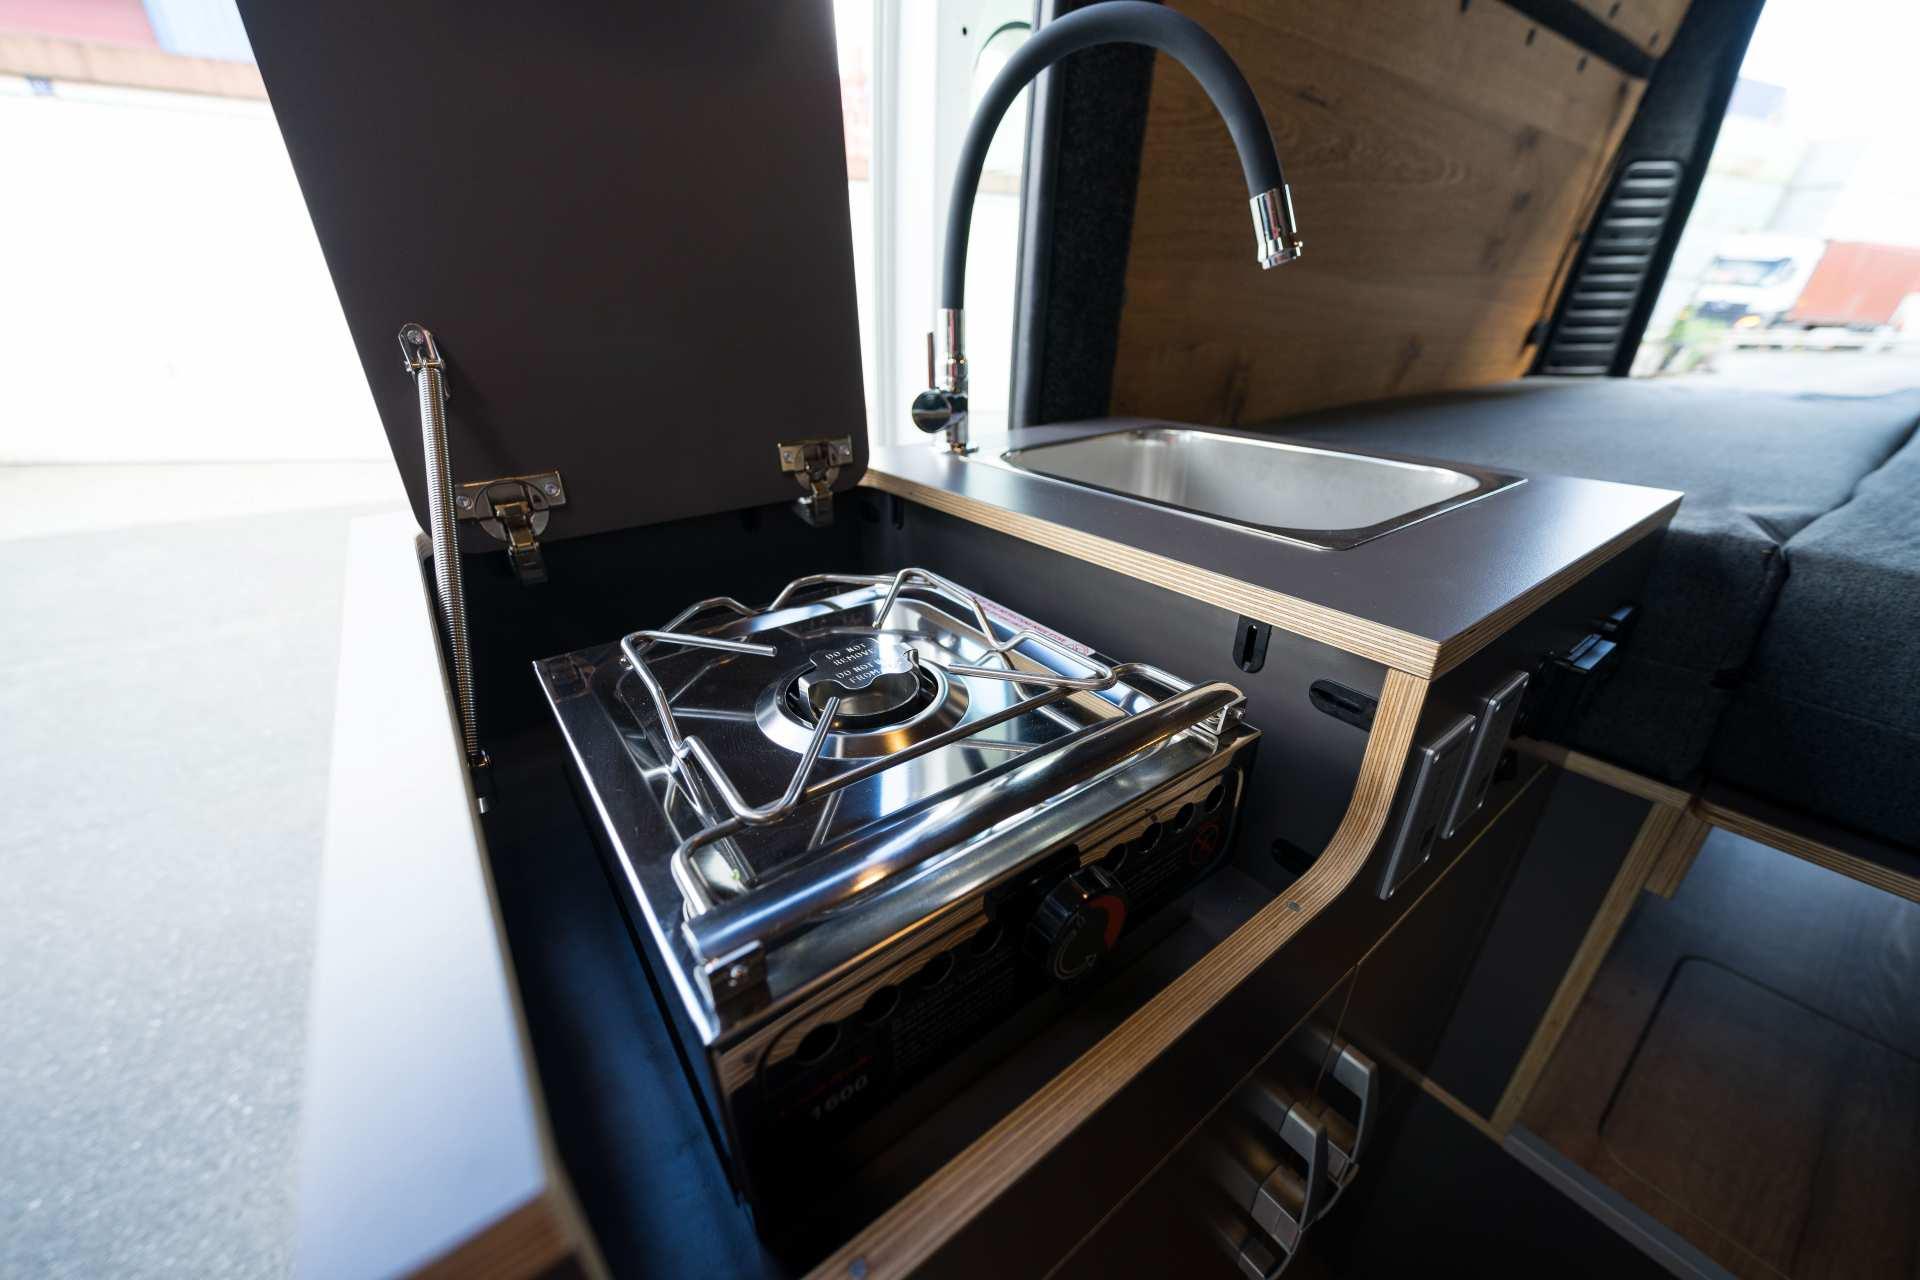 Individualausbau: Zwei-Raumwohnung Peugeot Boxer L2 H2 - 34